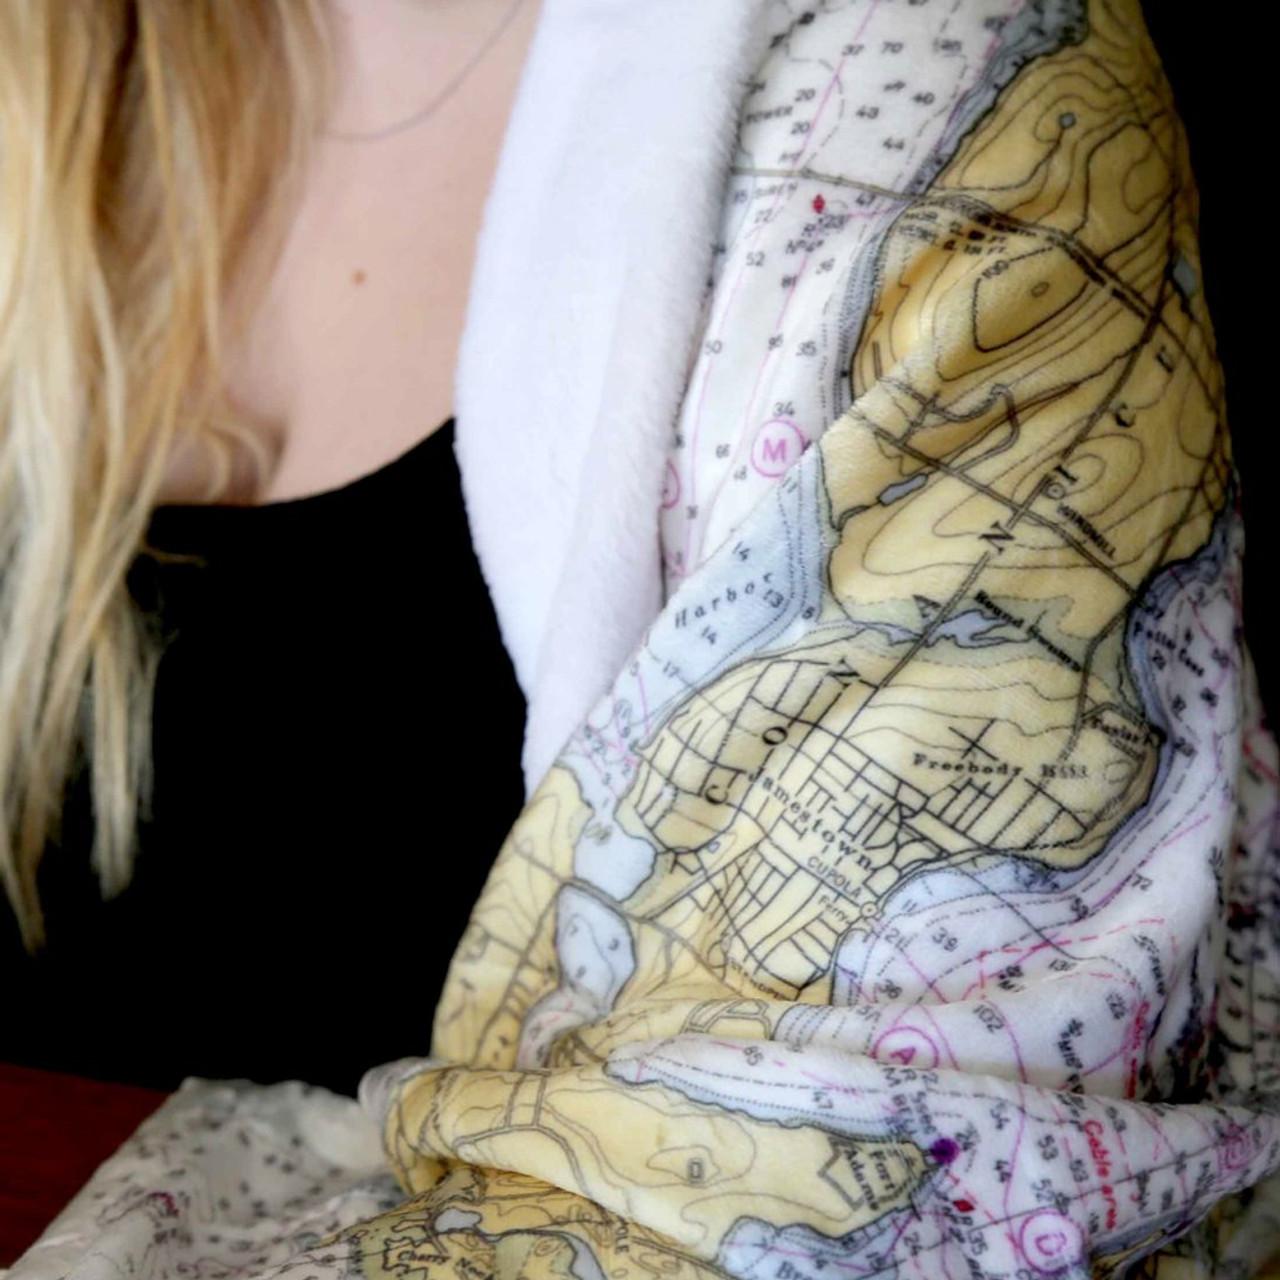 Nautical Blanket - East Lyme, CT #2